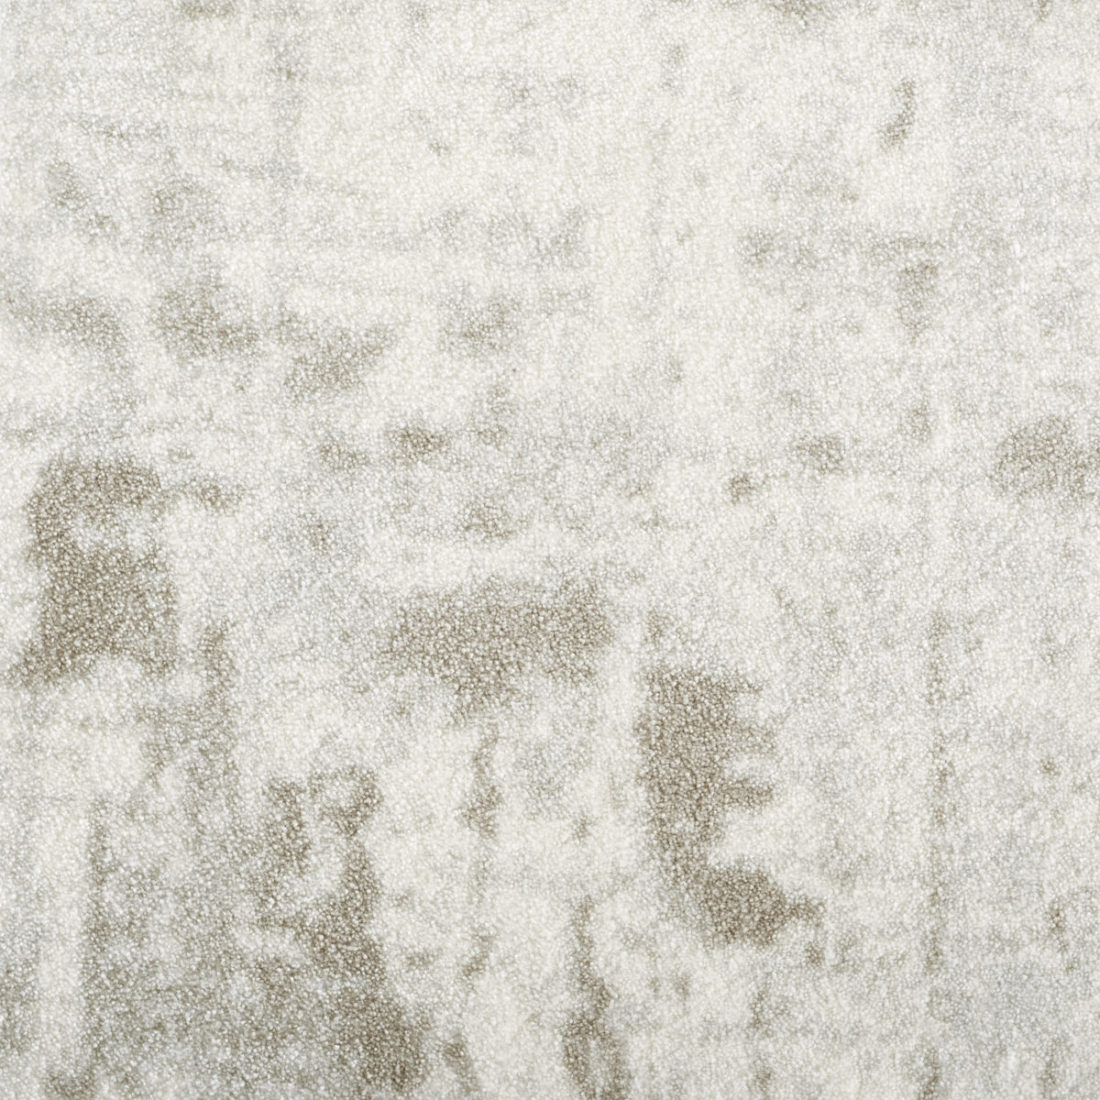 Stanton Carpet Oxford St Iced Mint